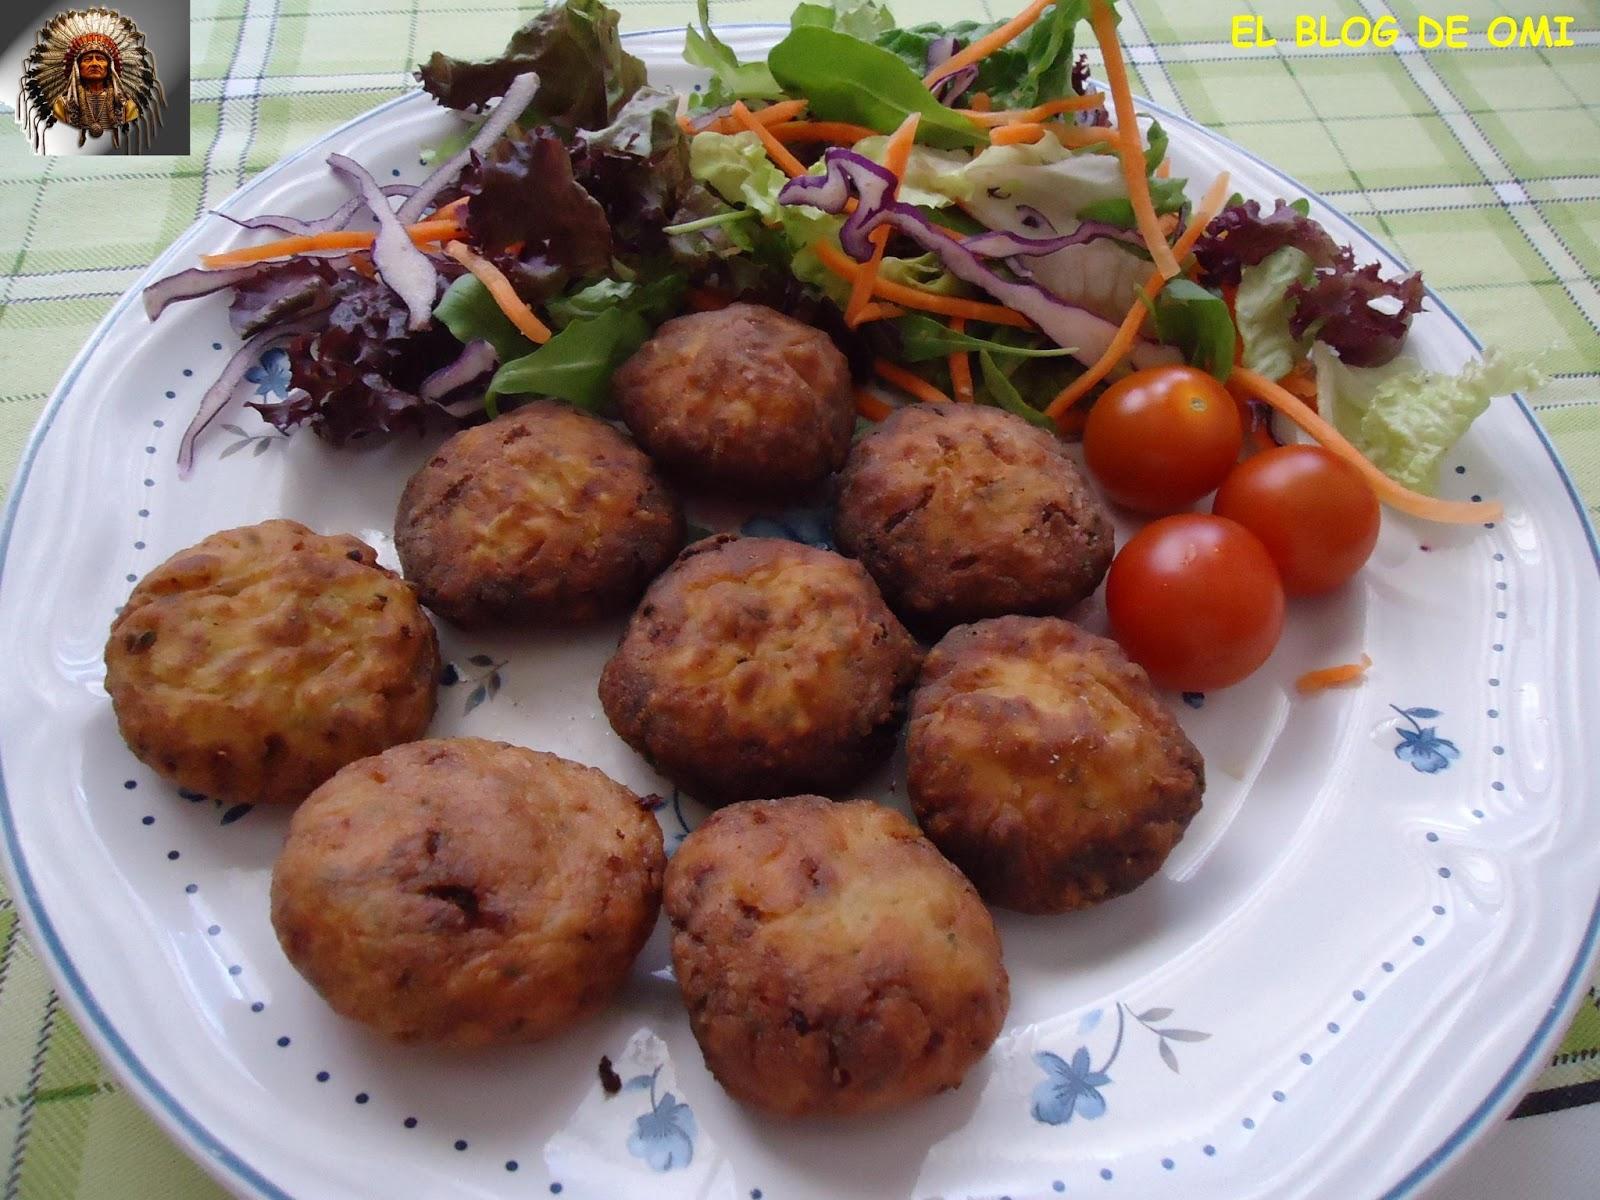 El blog de omi alb ndigas de patata y reques n - Albondigas de patata ...